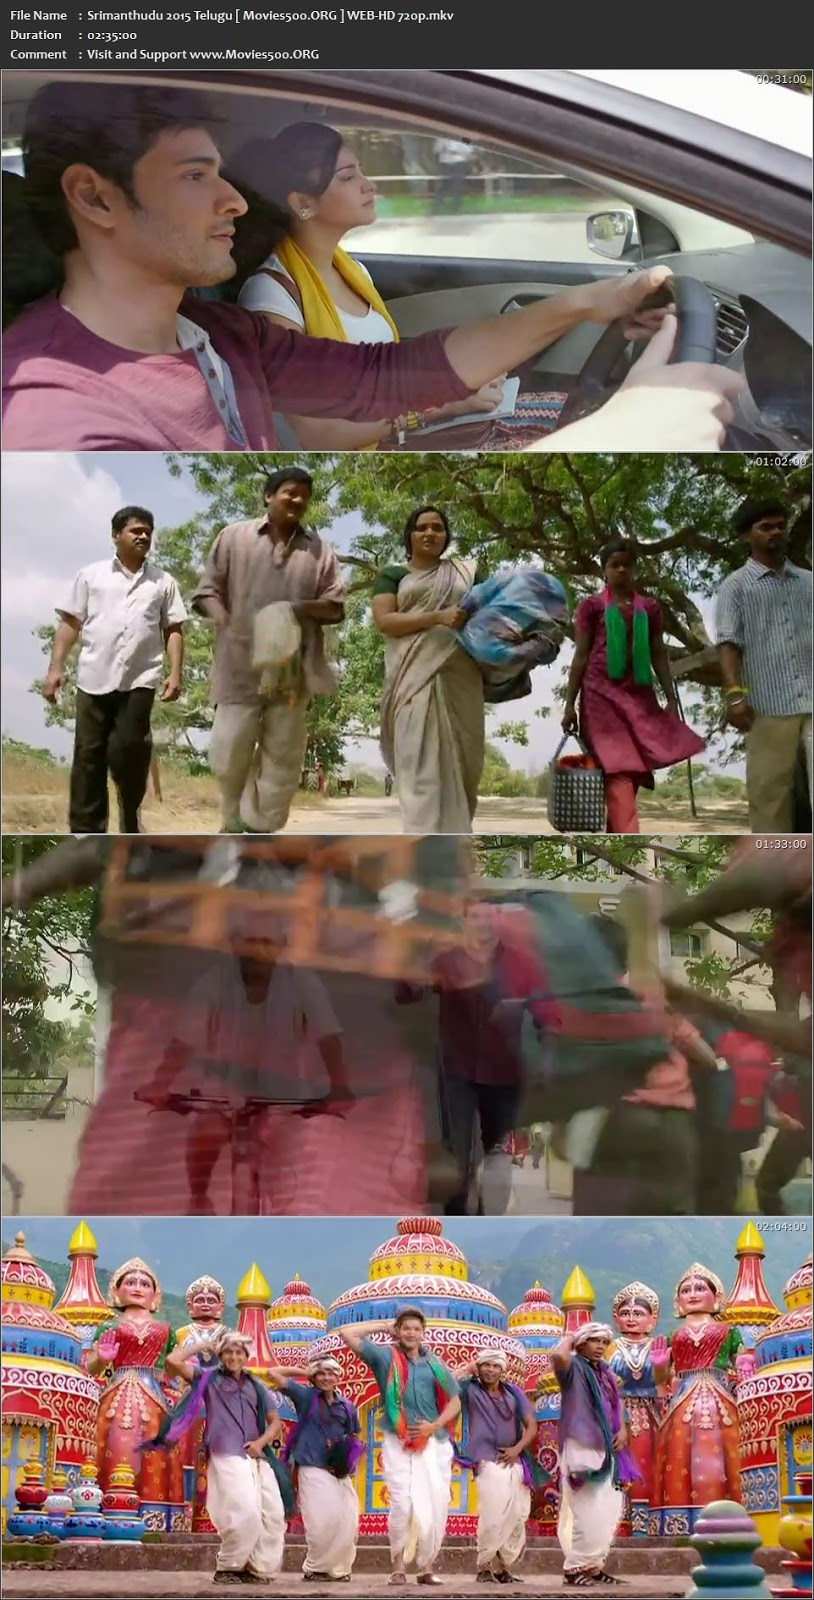 Srimanthudu 2015 Telugu Full Movie WEB HD 720p at movies500.info